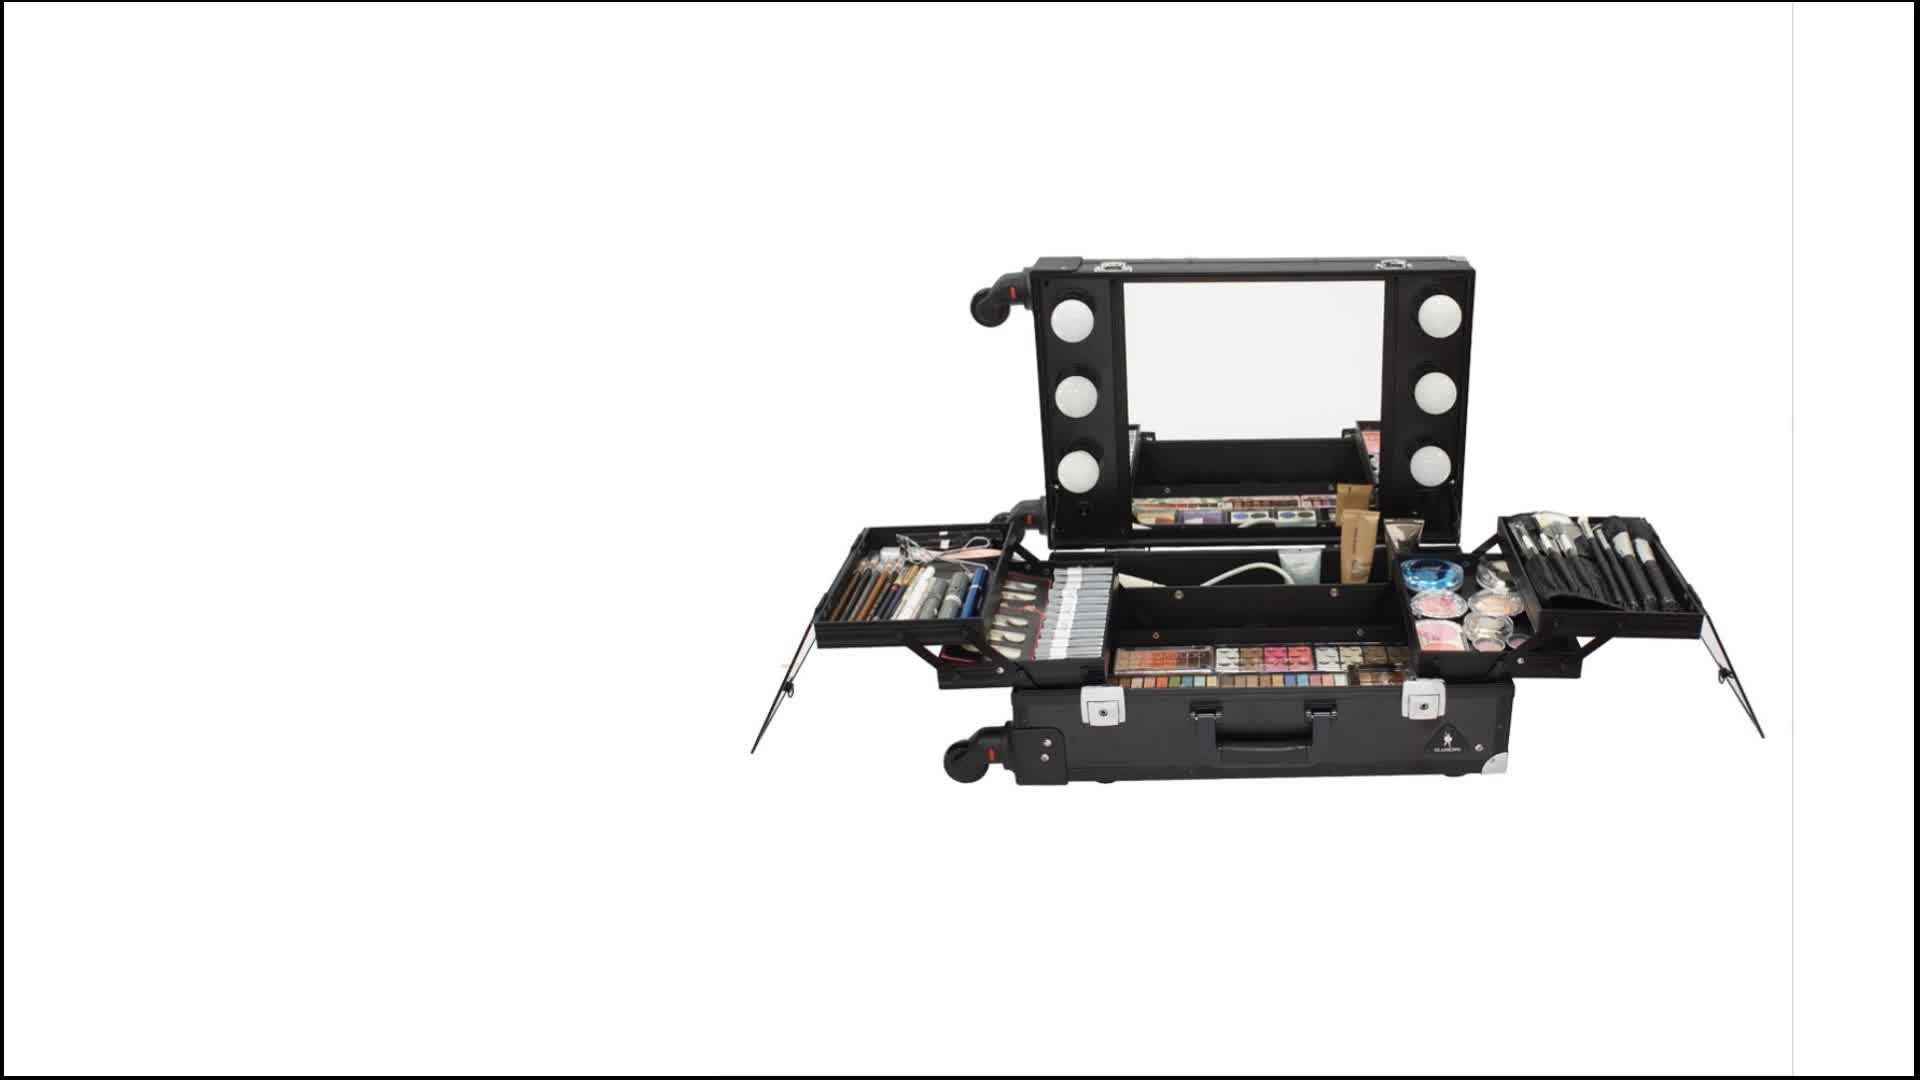 GLADKING rolling pro lighted makeup aluminum case station